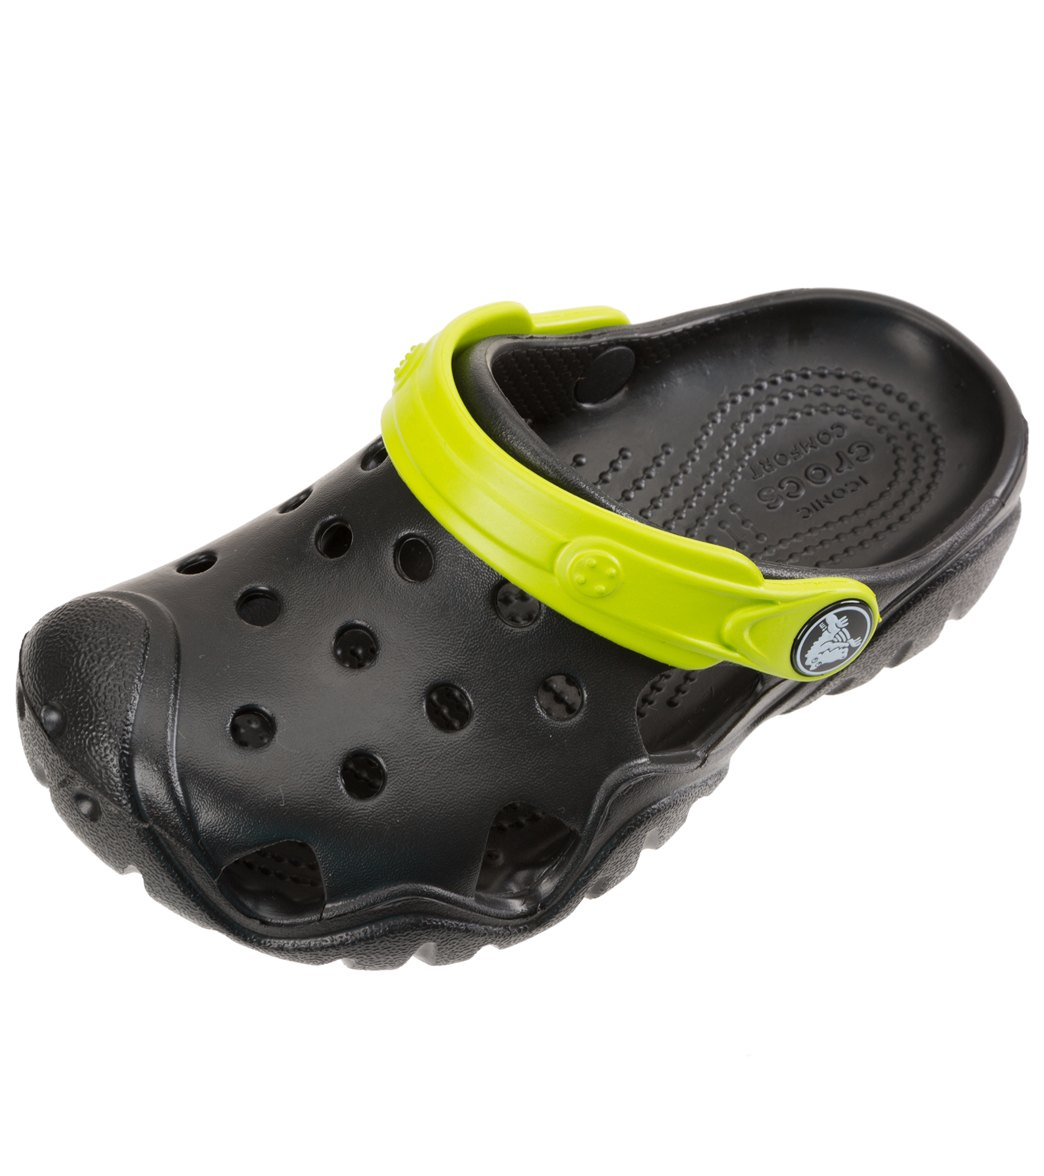 cdefe40e03504 Crocs Kids  Swiftwater Clog (Toddler  Big Kid  Little Kid) at ...